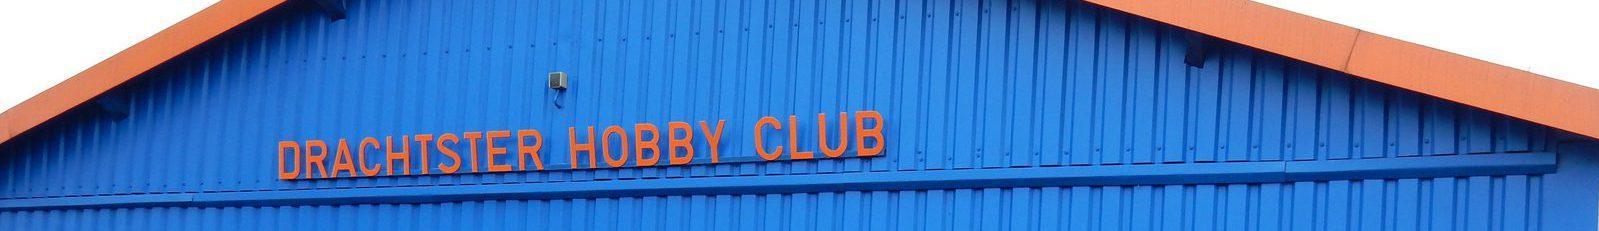 Drachtster Hobby Club